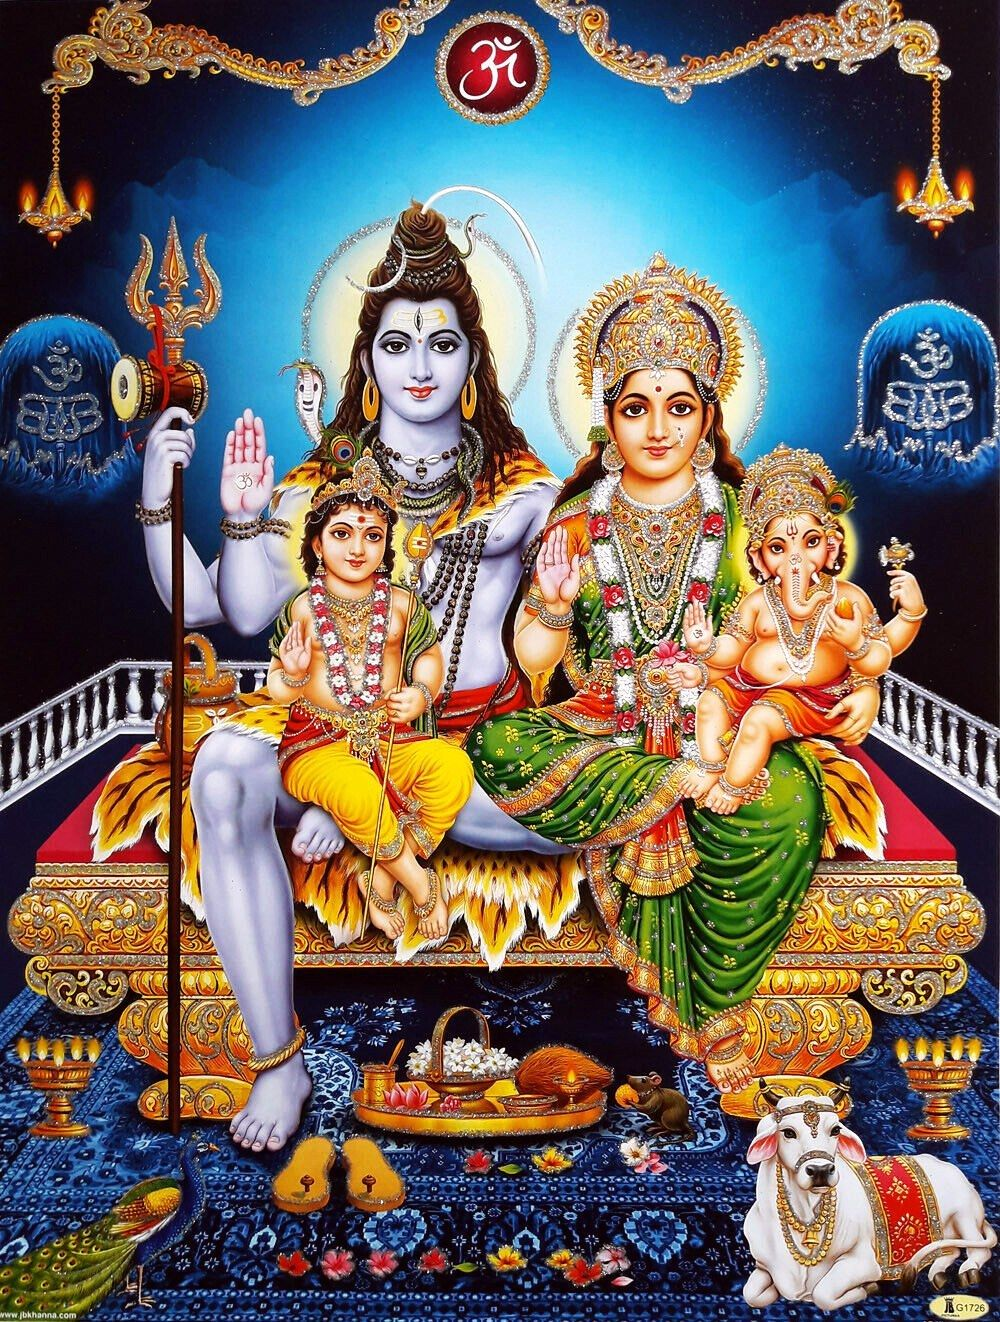 300+ Shiva Parvati HD Images (2019) Love Marriage Pics Free